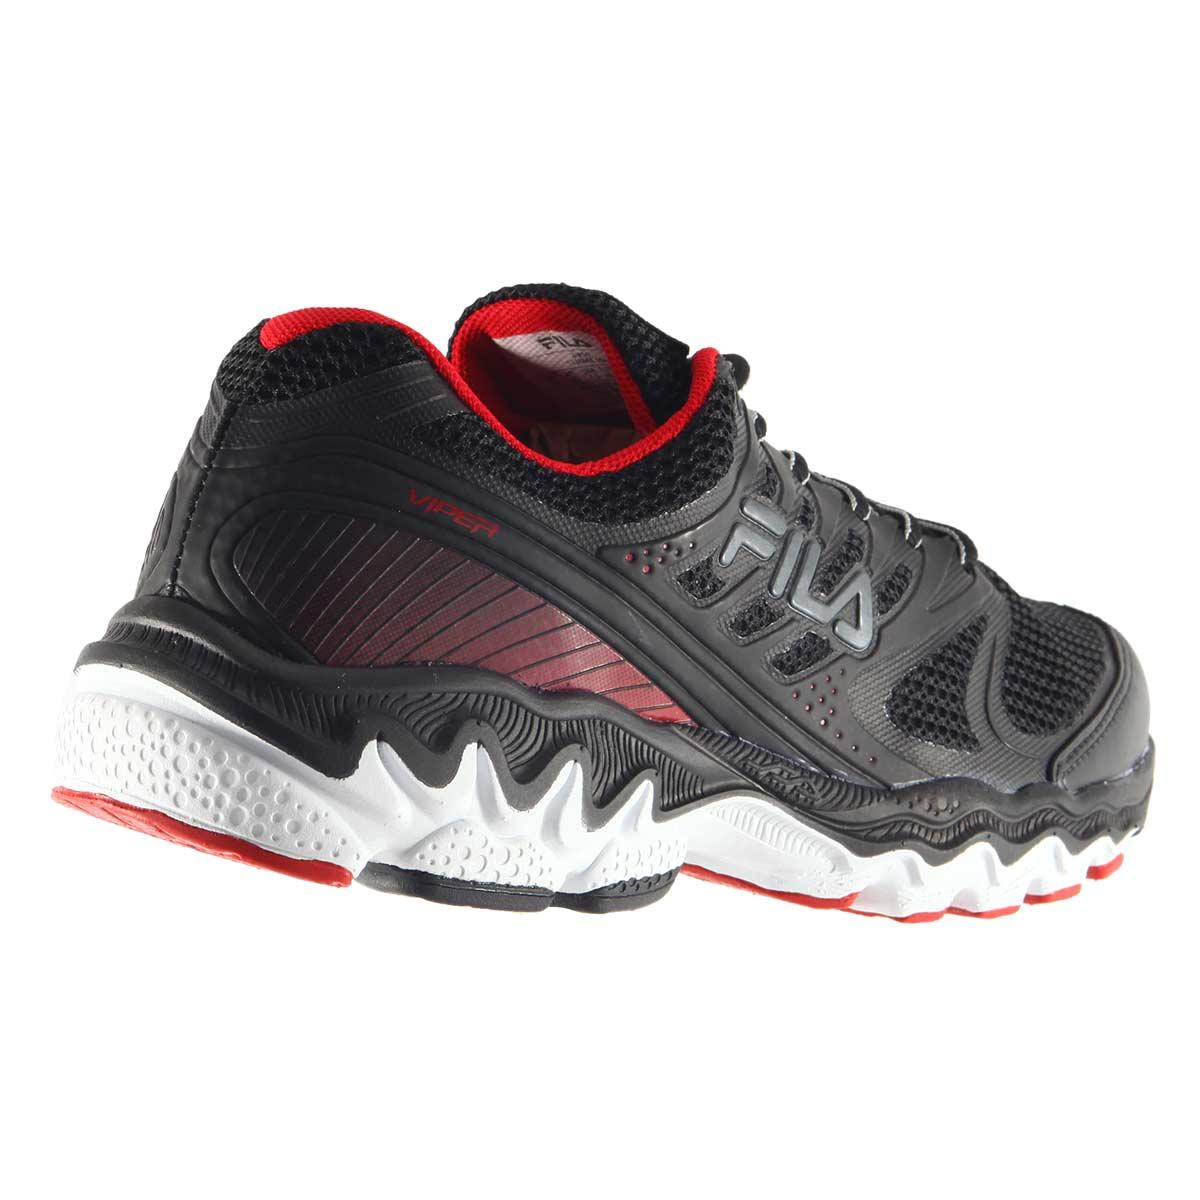 00c4b02f4f3 Tênis Fila Viper Masculino Caminhada Corrida 11J484X